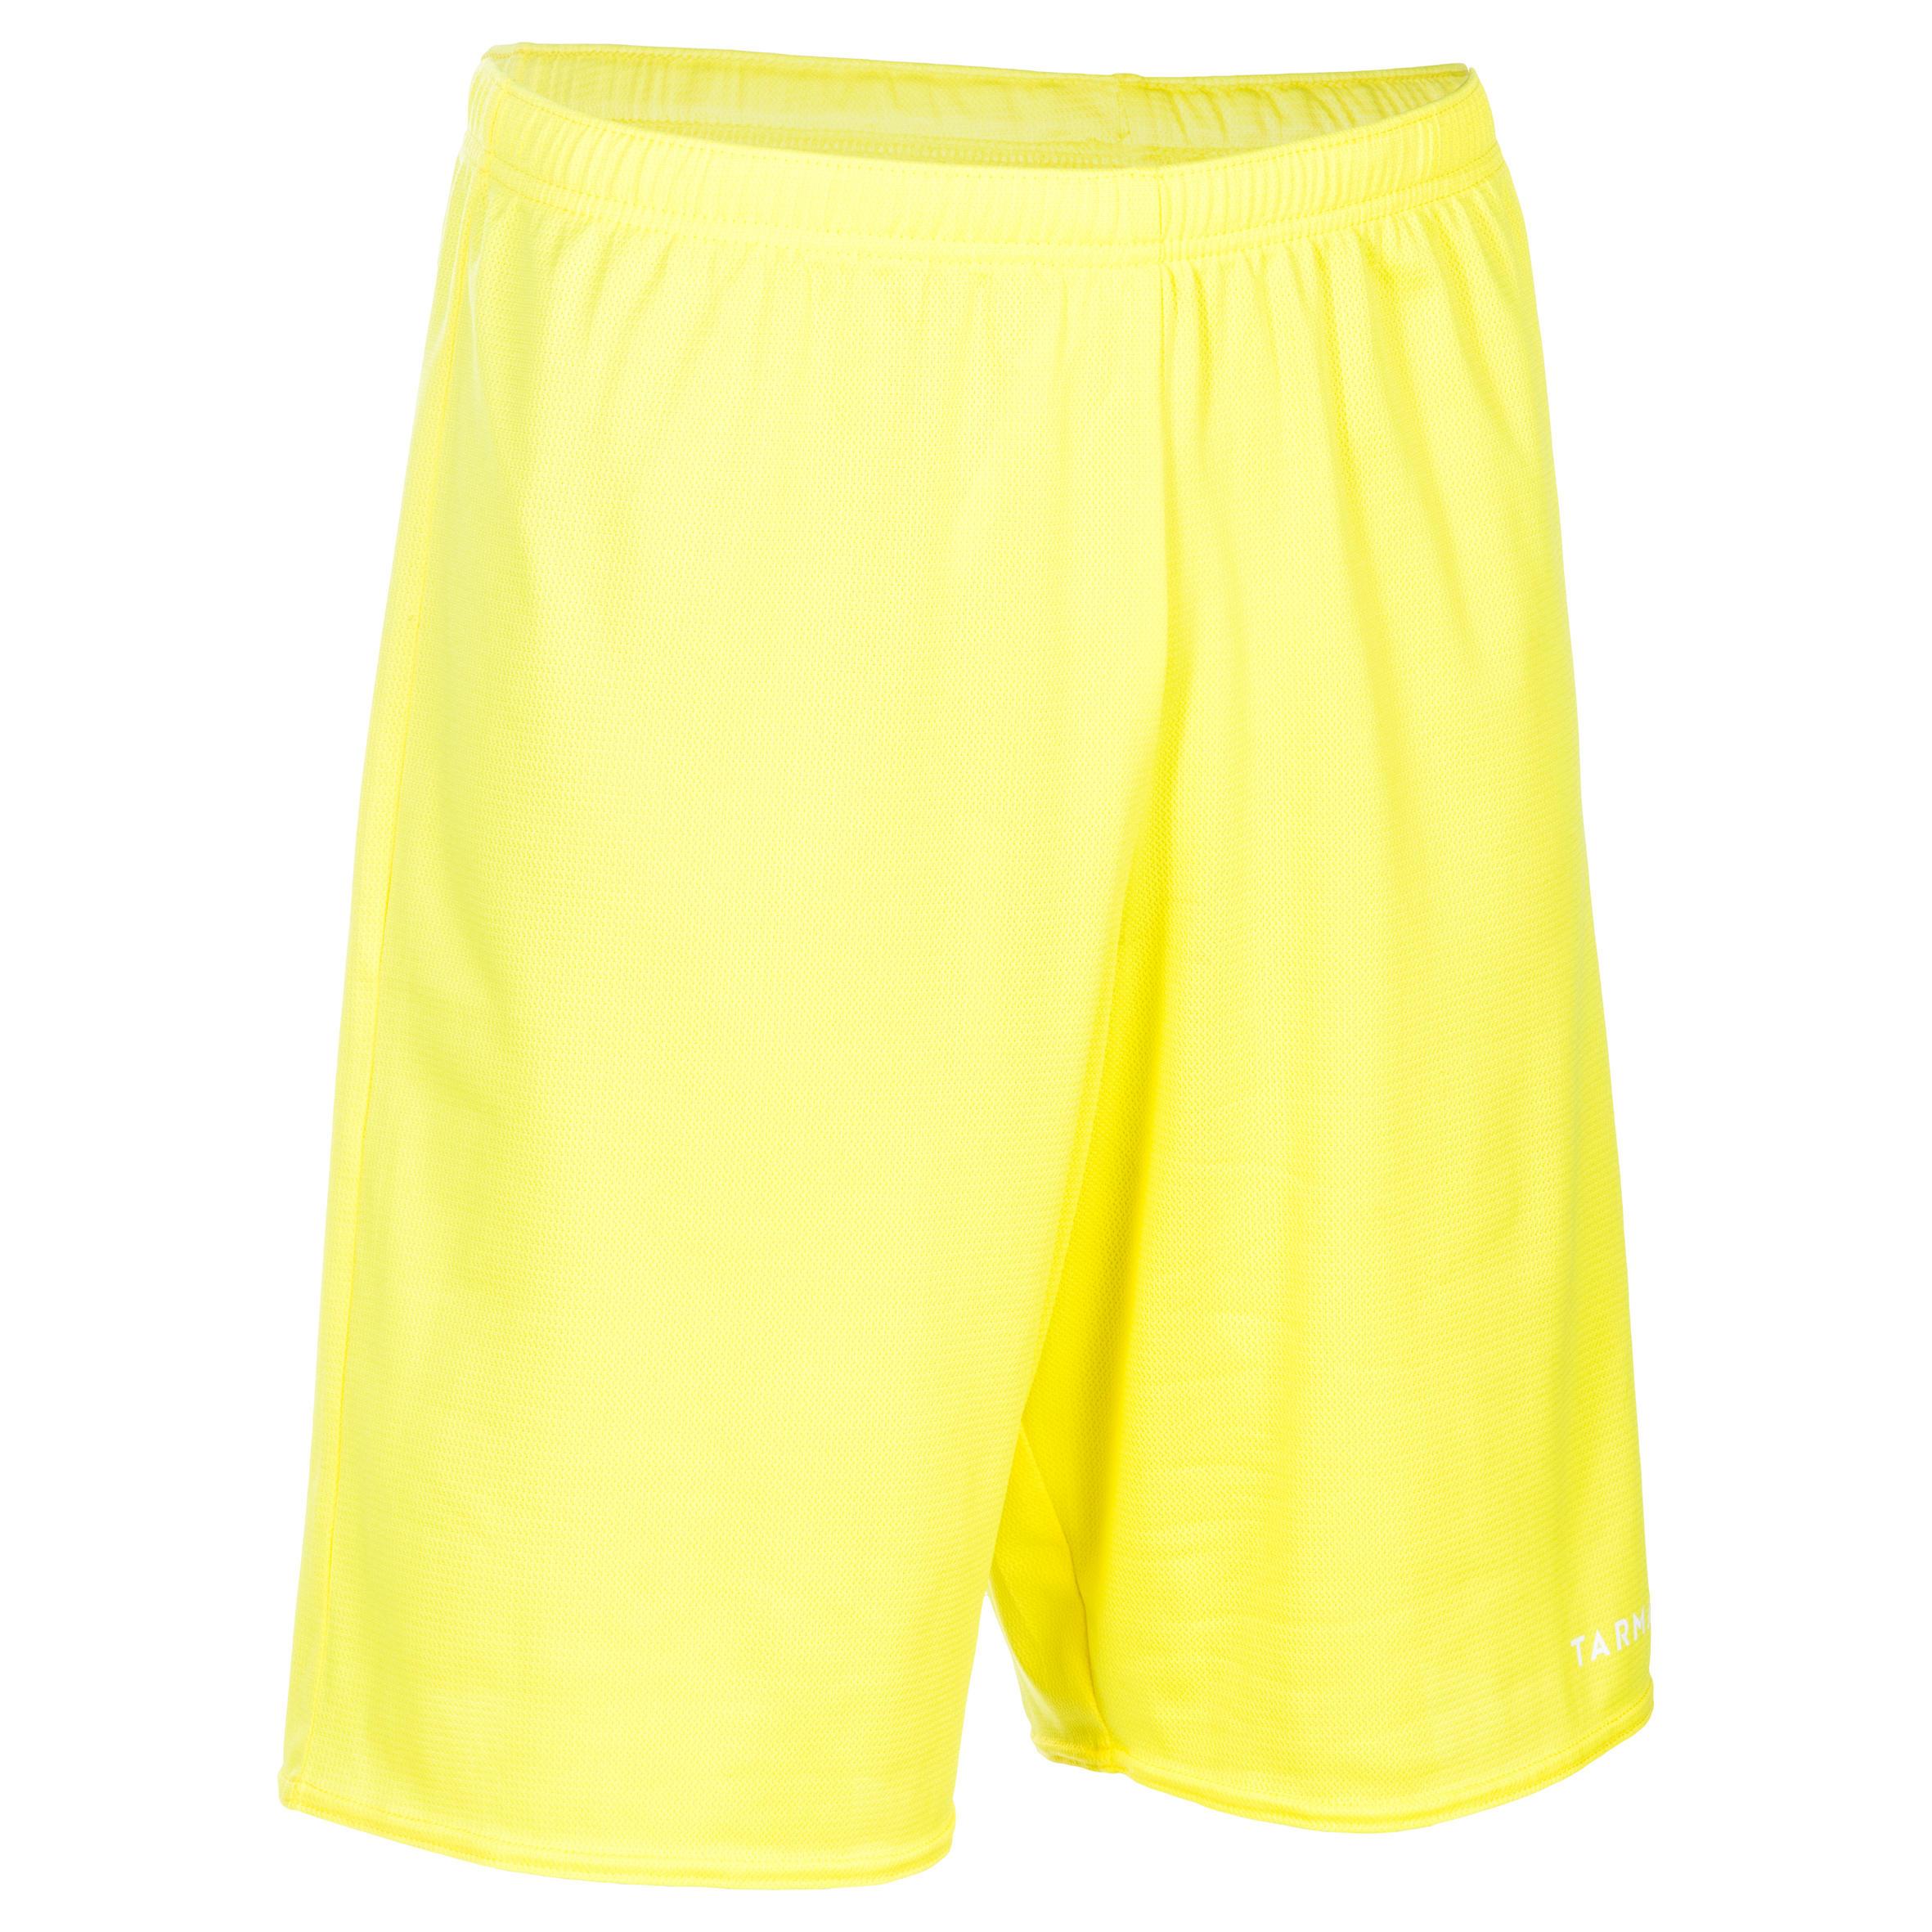 Basketballshorts SH100 Erwachsene gelb   Sportbekleidung > Sporthosen > Basketballshorts   Gelb - Weiß   Tarmak